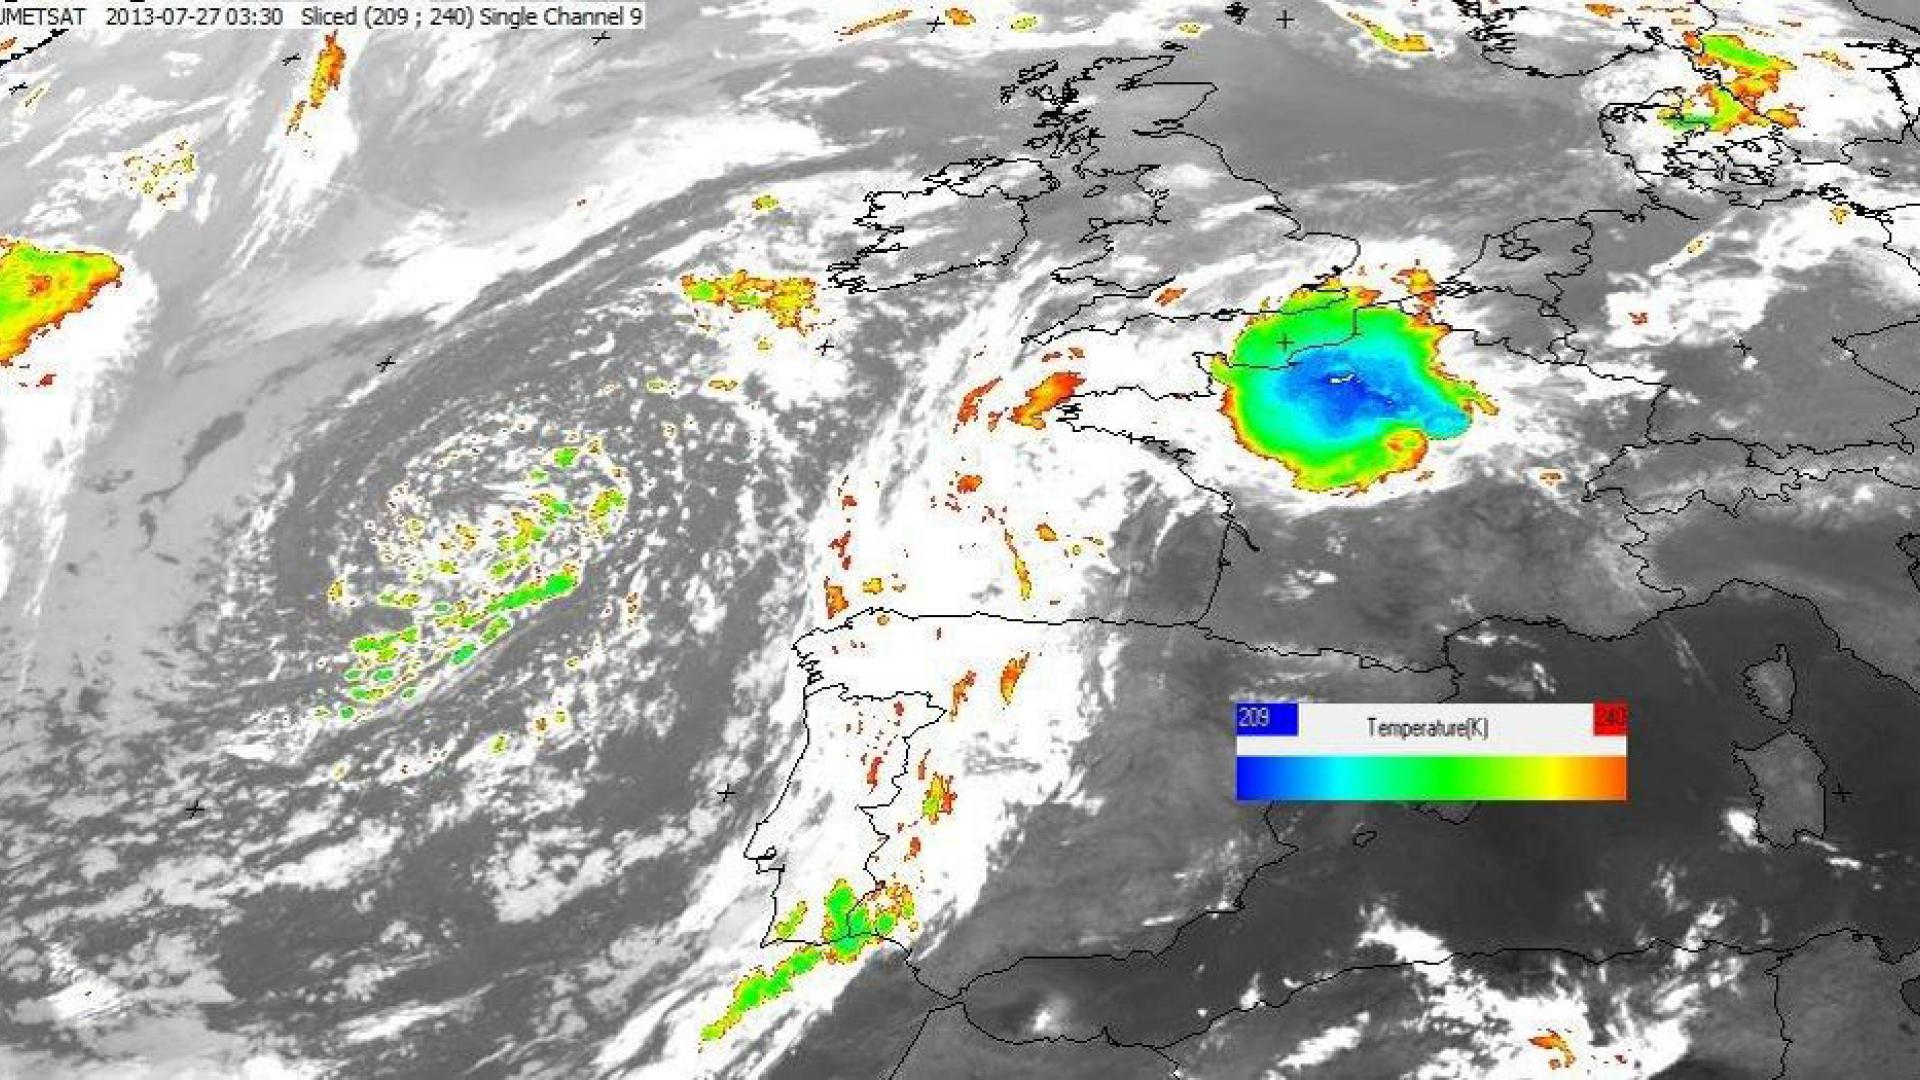 Huge convective precipitation cell crosses France